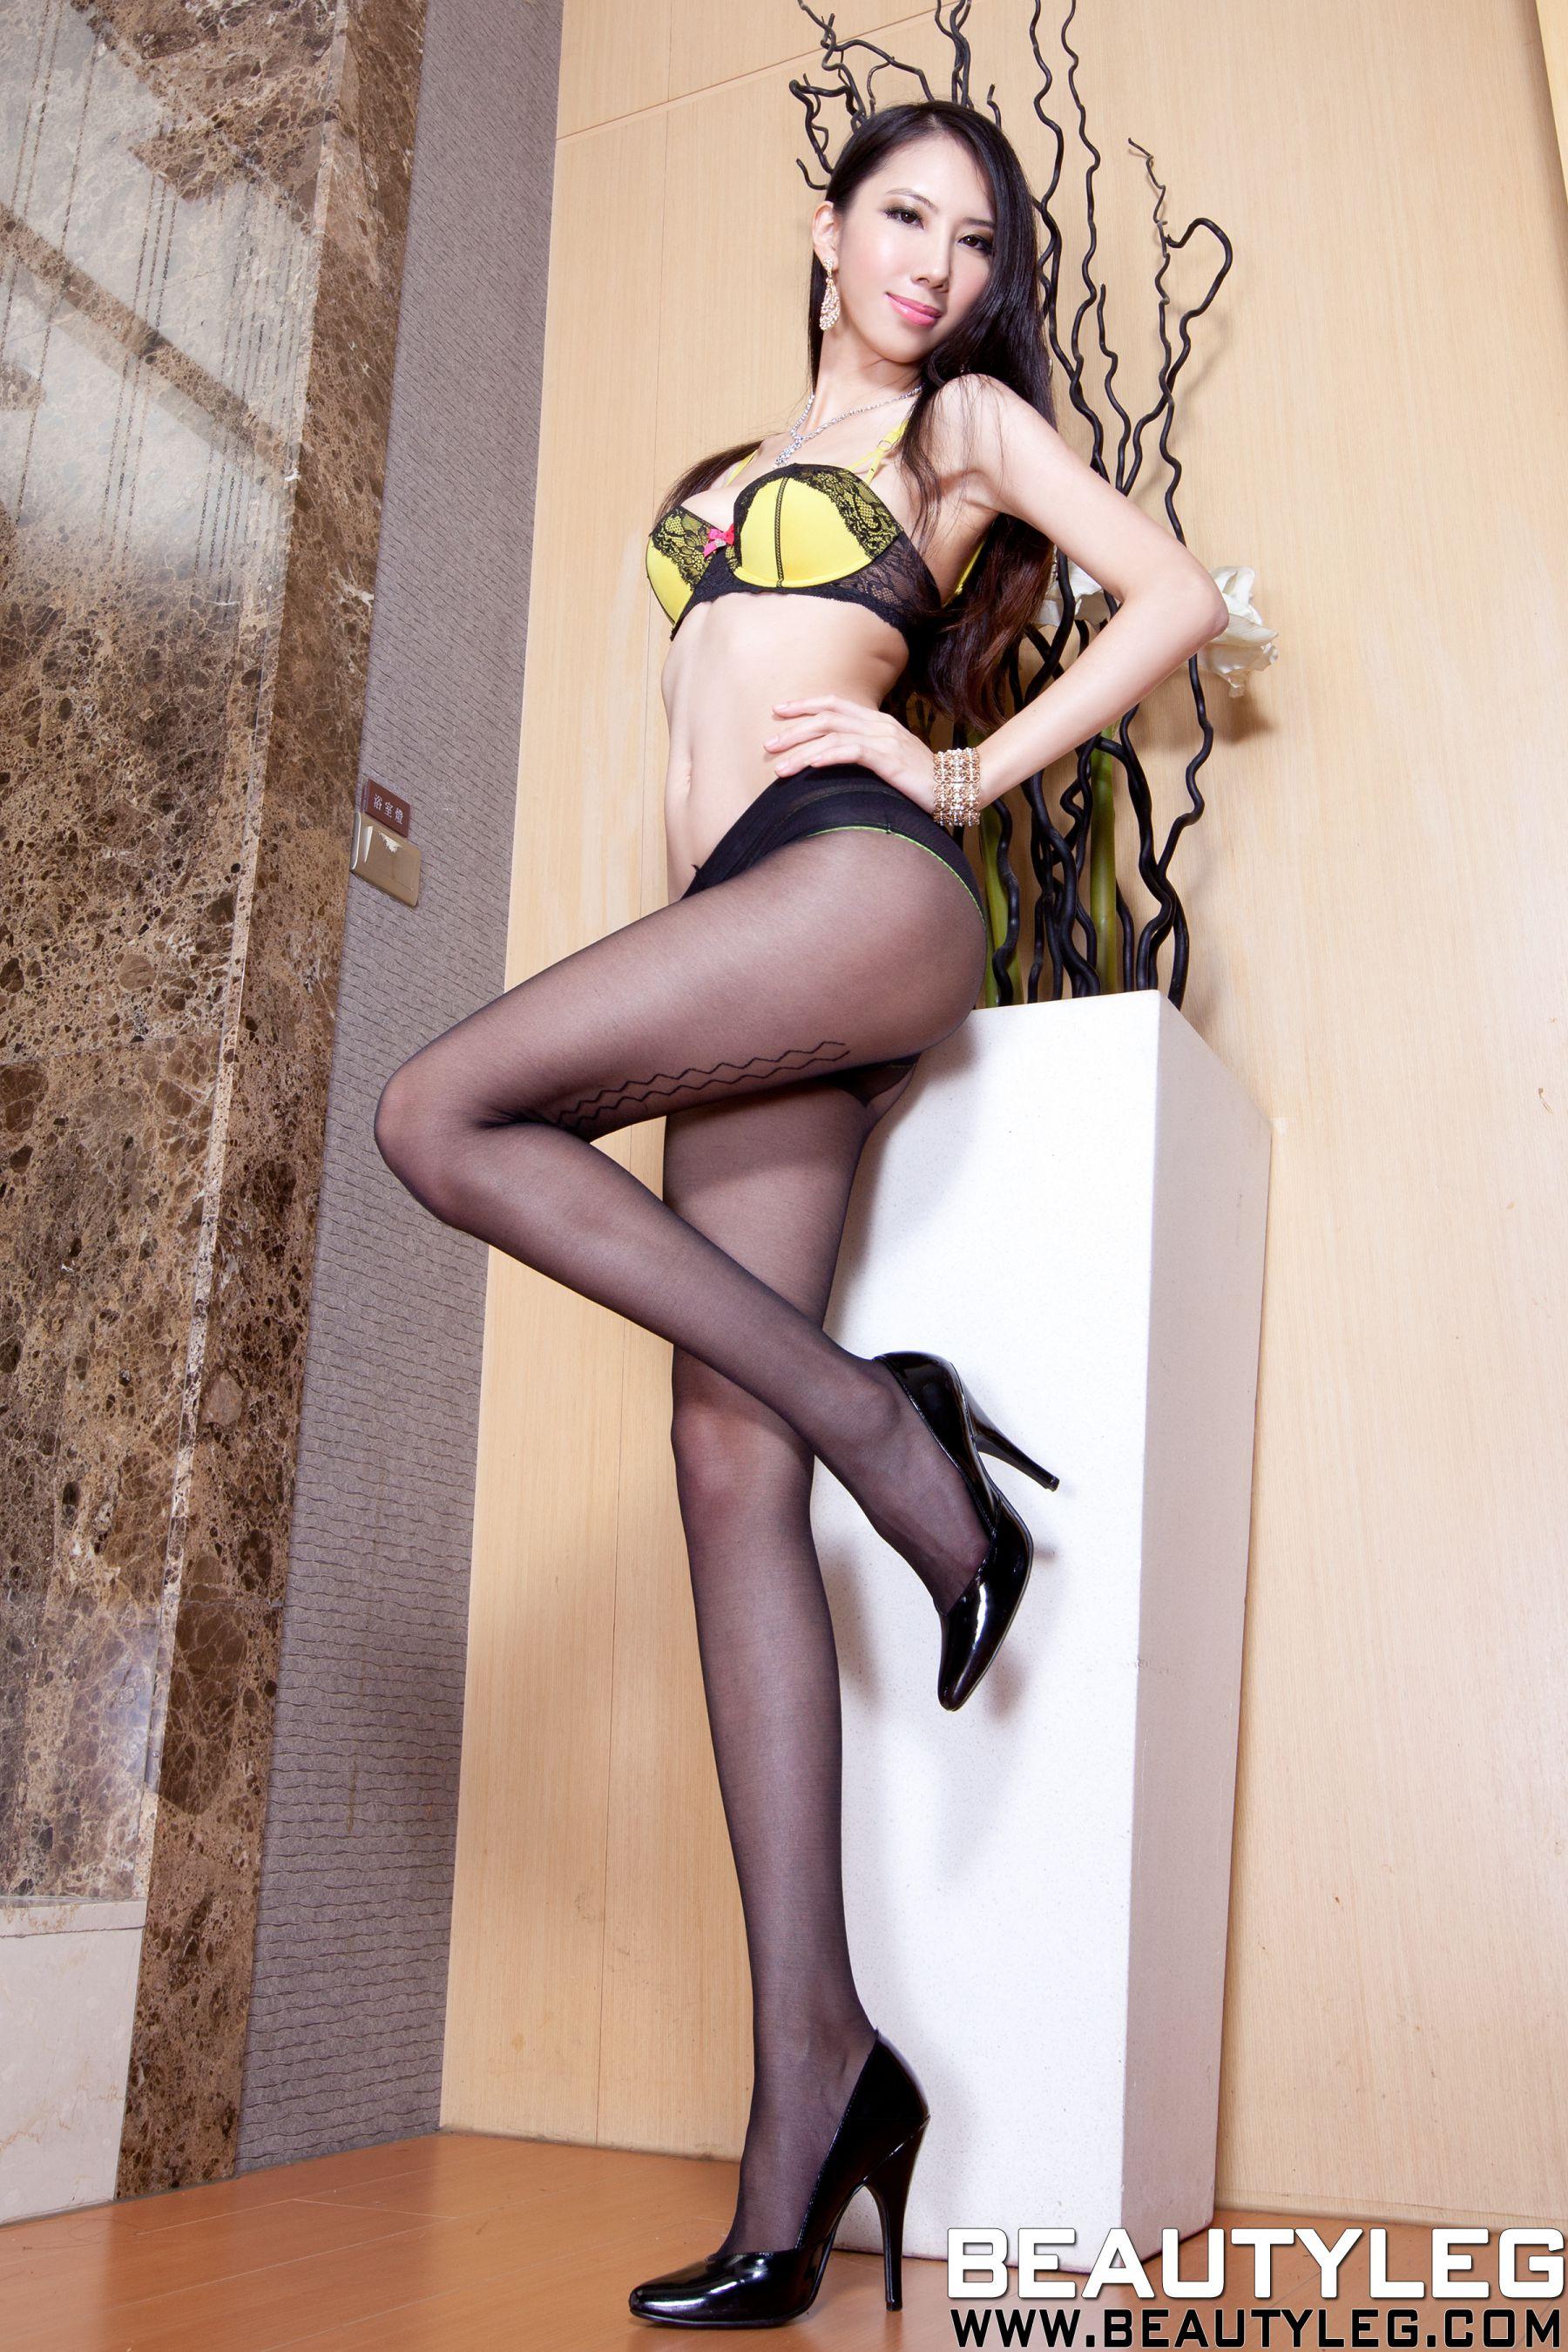 VOL.580 [Beautyleg]美腿黑丝内衣美女:童采萱(Beautyleg Yoyo,腿模Yoyo)高品质写真套图(47P)